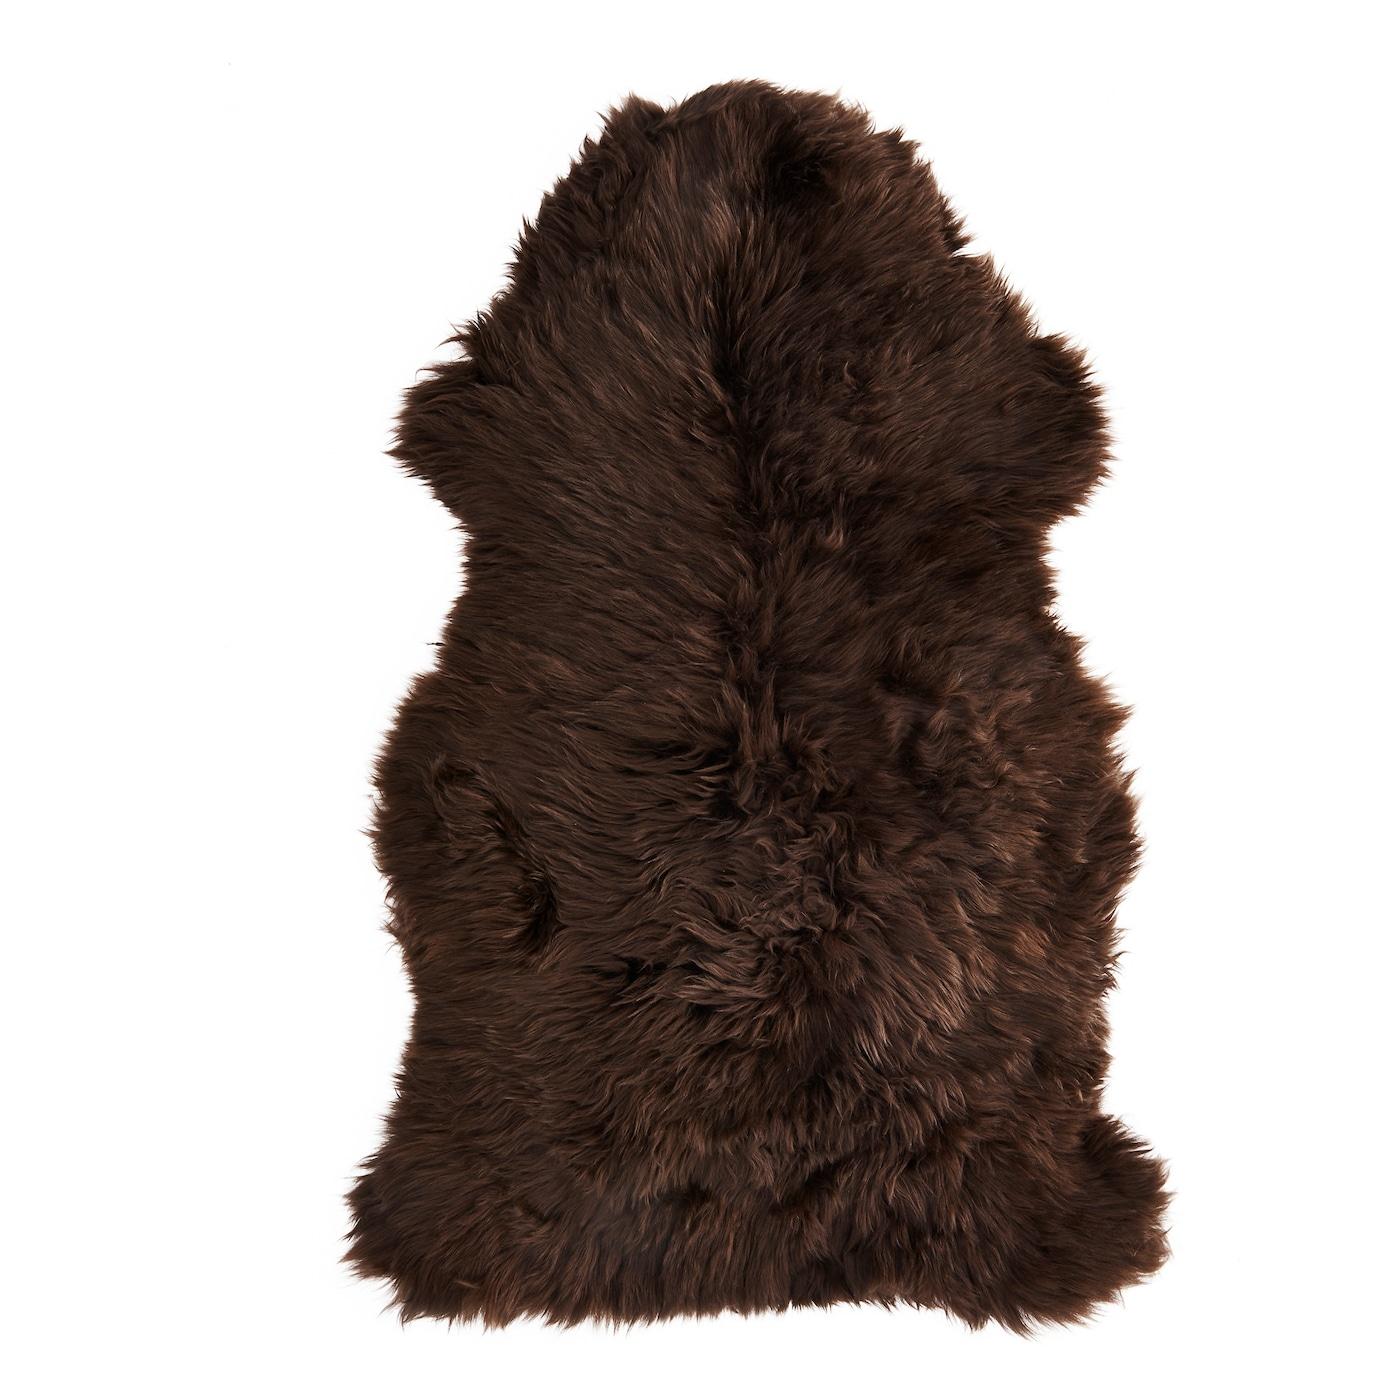 skold sheepskin dark brown 90 cm ikea. Black Bedroom Furniture Sets. Home Design Ideas